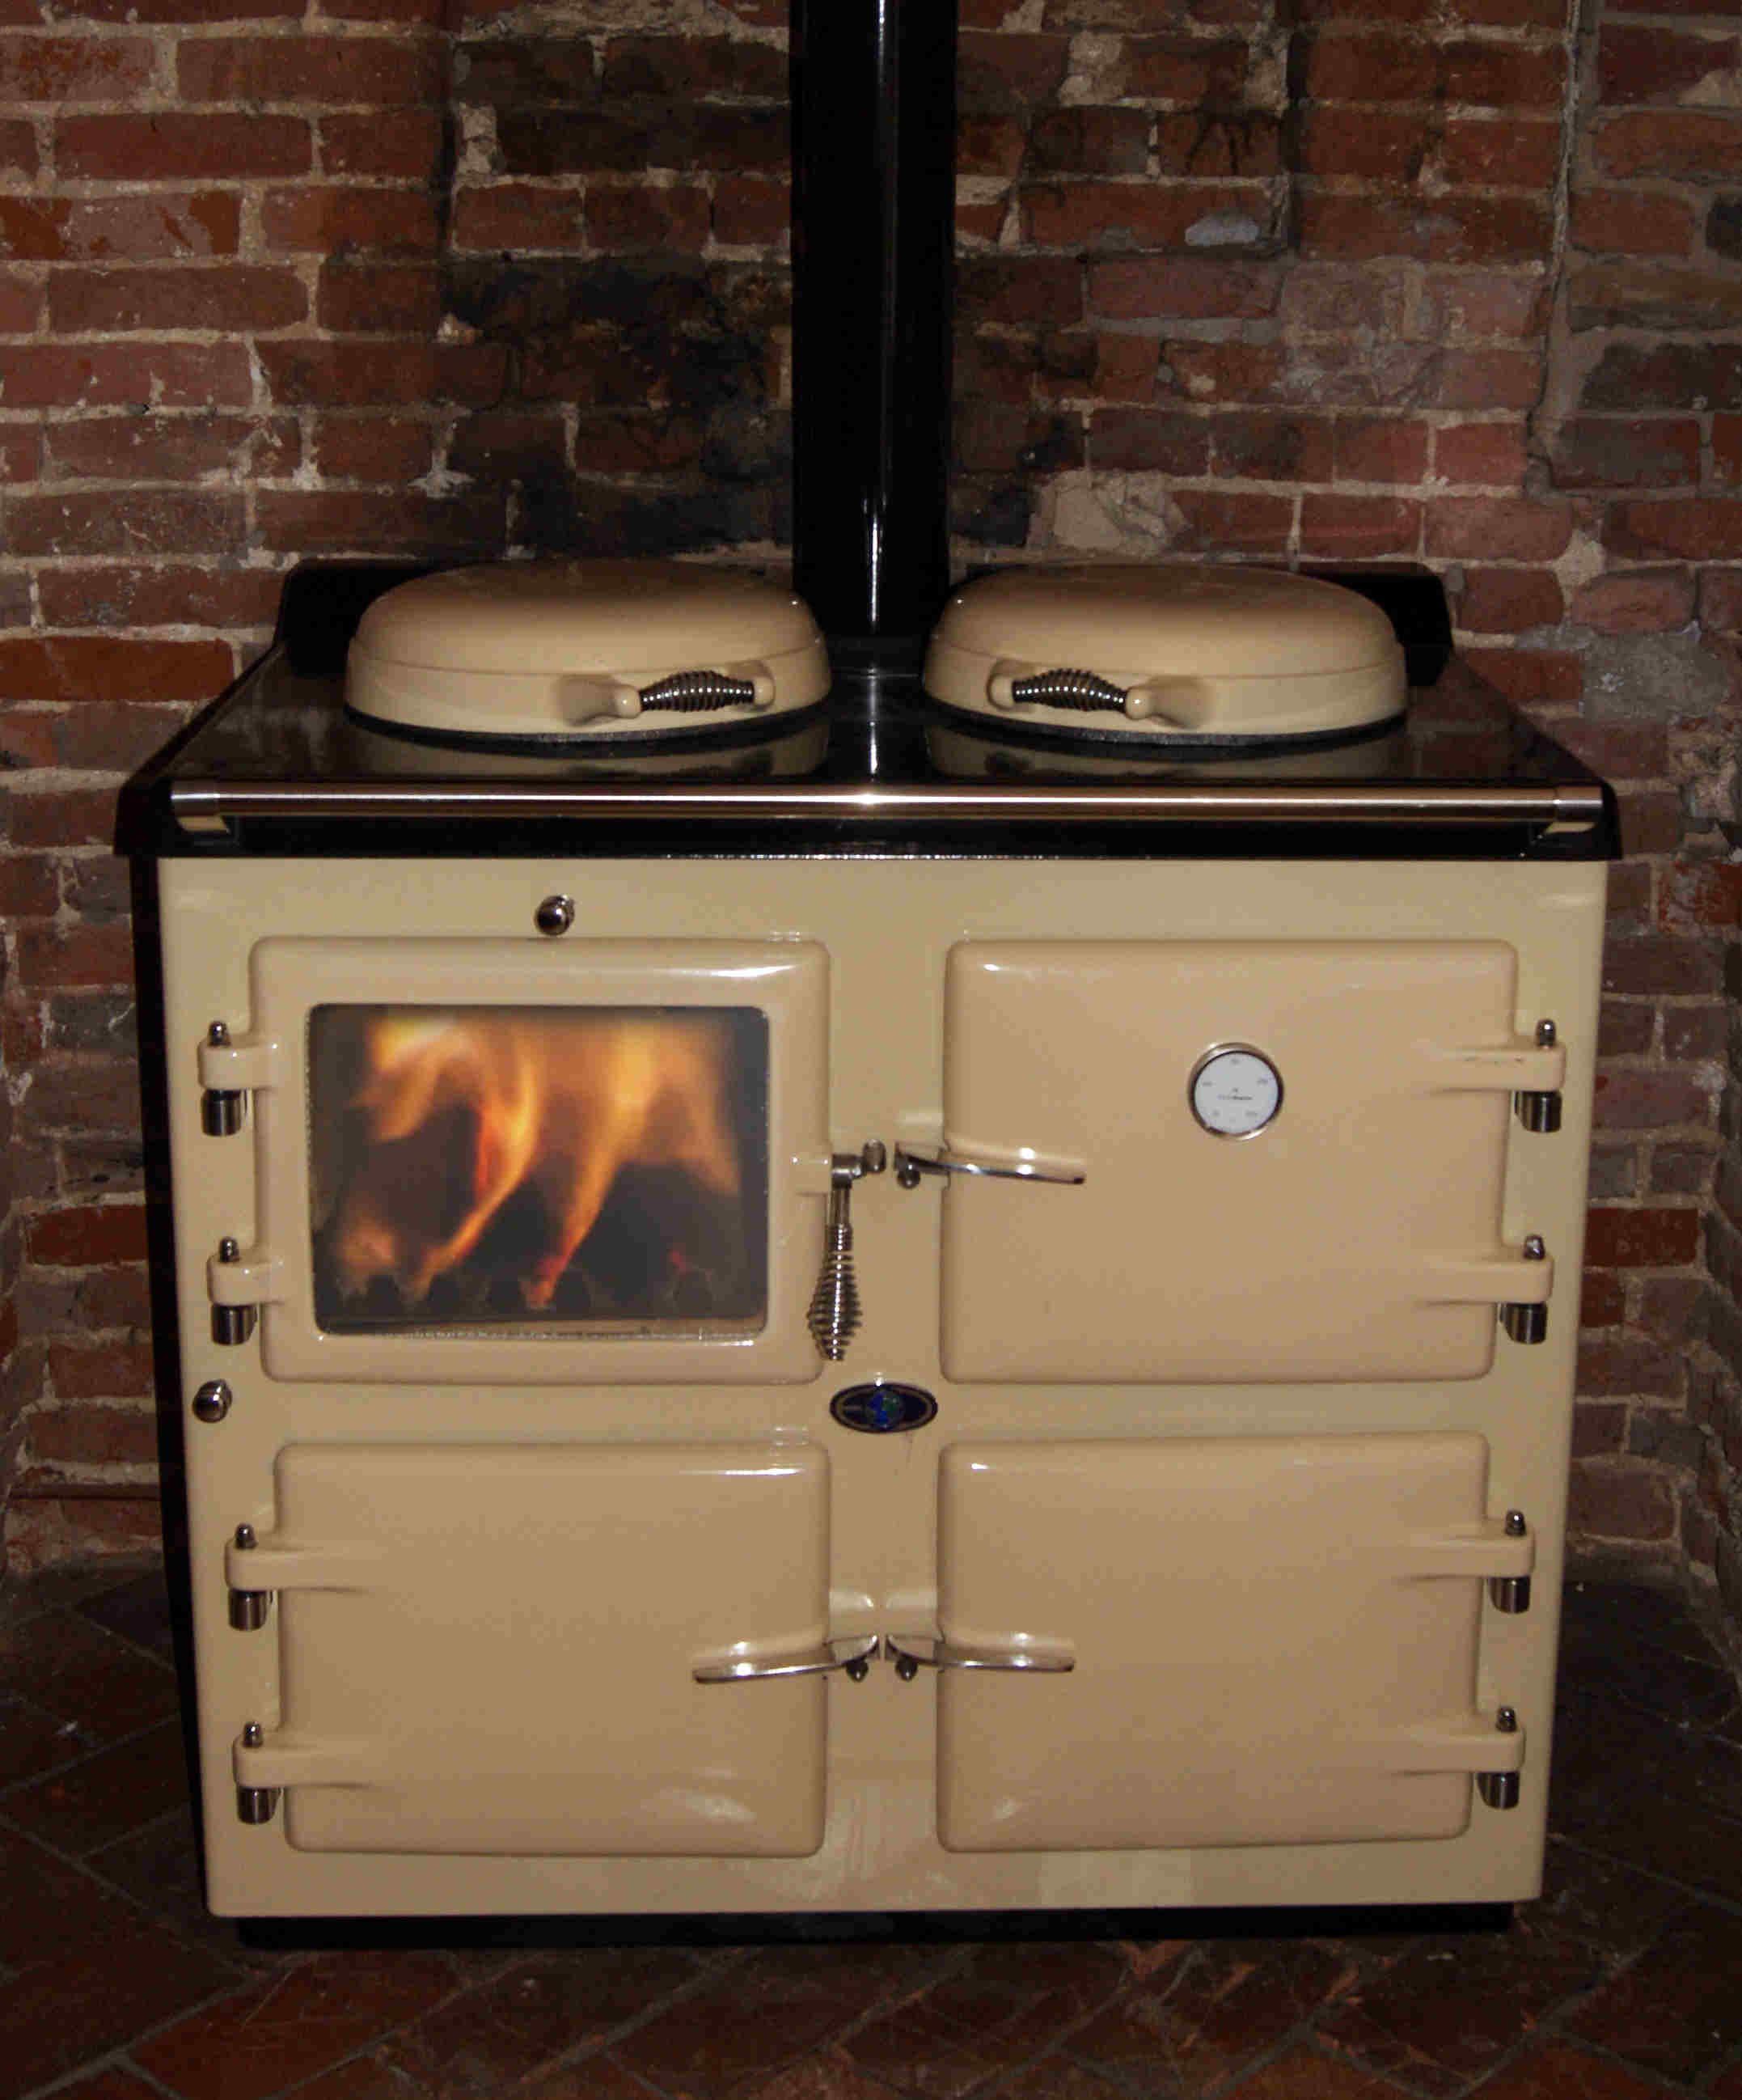 nobel oven instruction manual